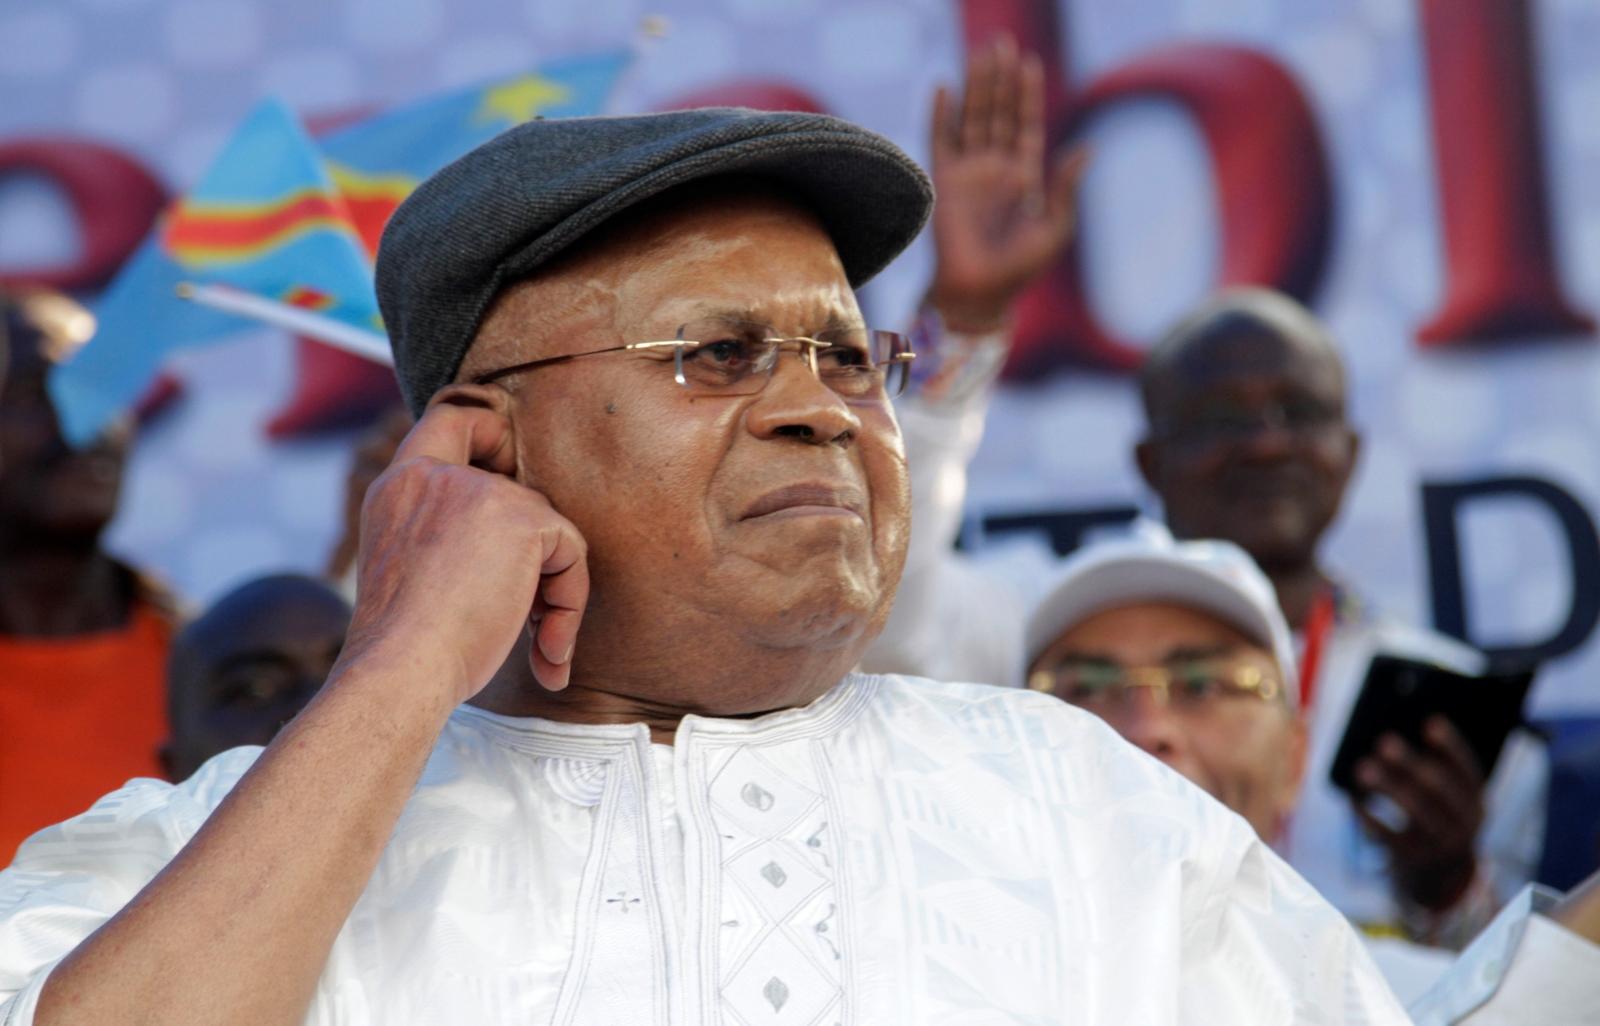 DRC: Tributes flood in after symbol of resistance Etienne Tshisekedi dies, aged 84